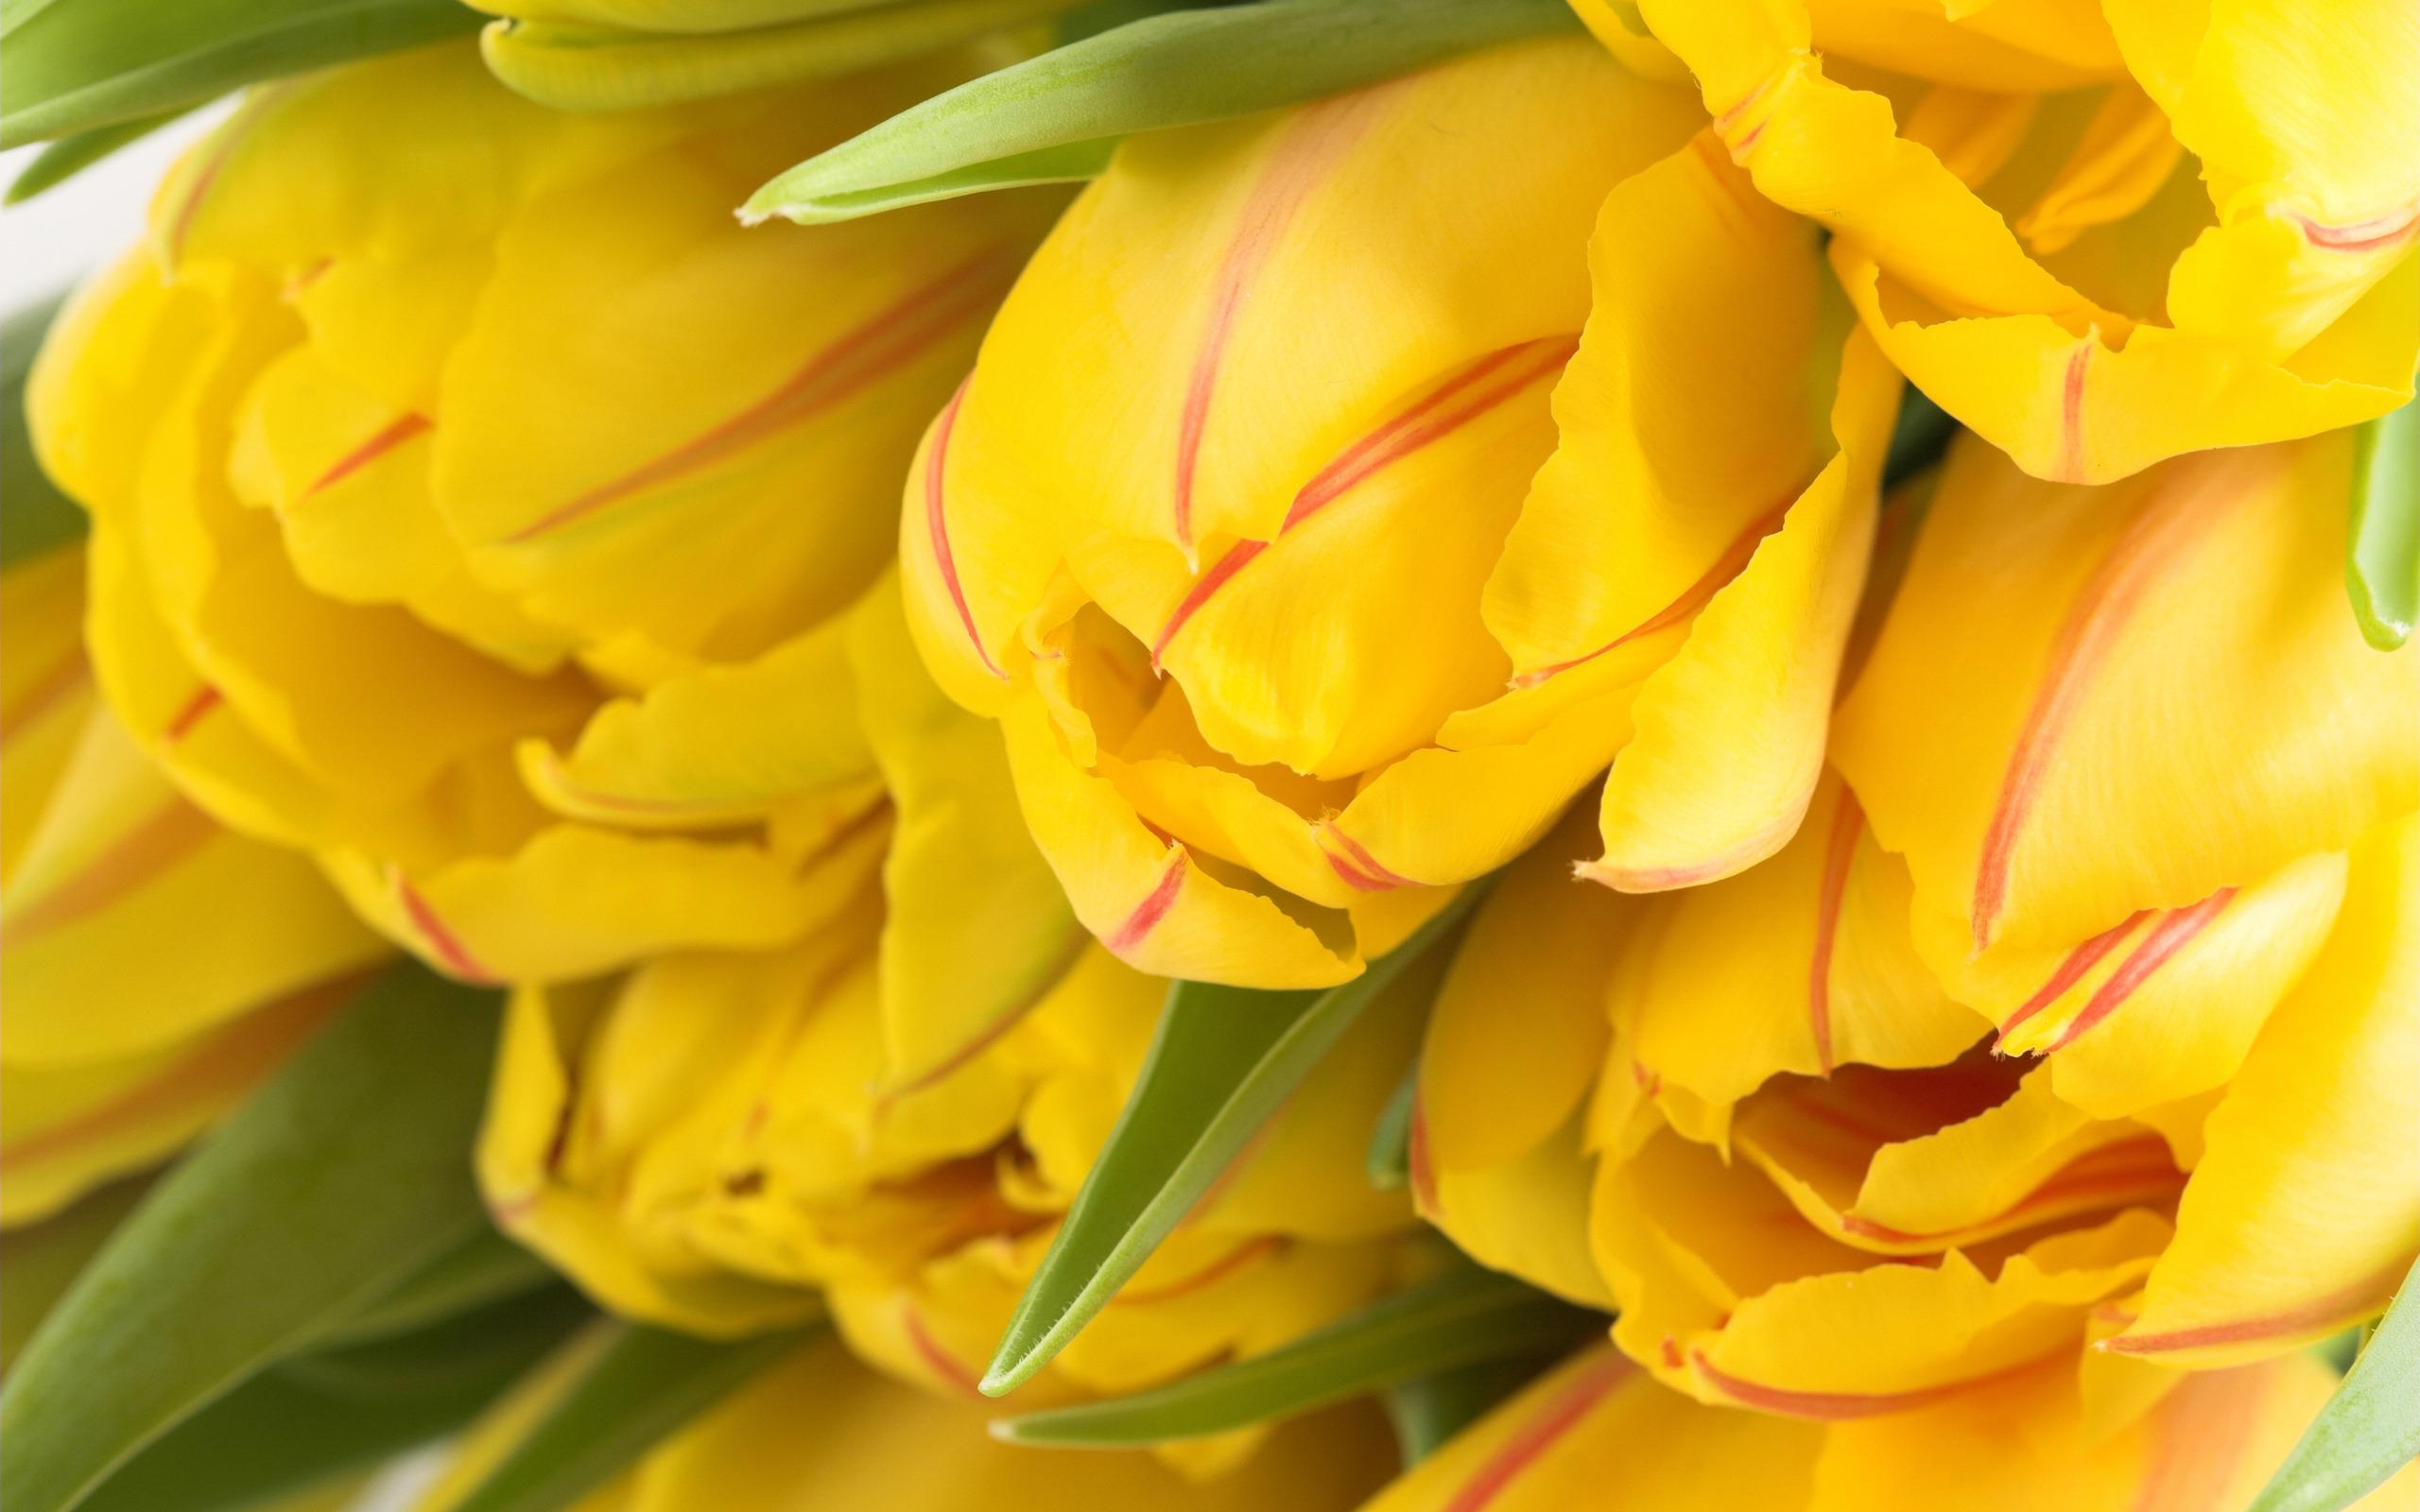 tulips background yellow